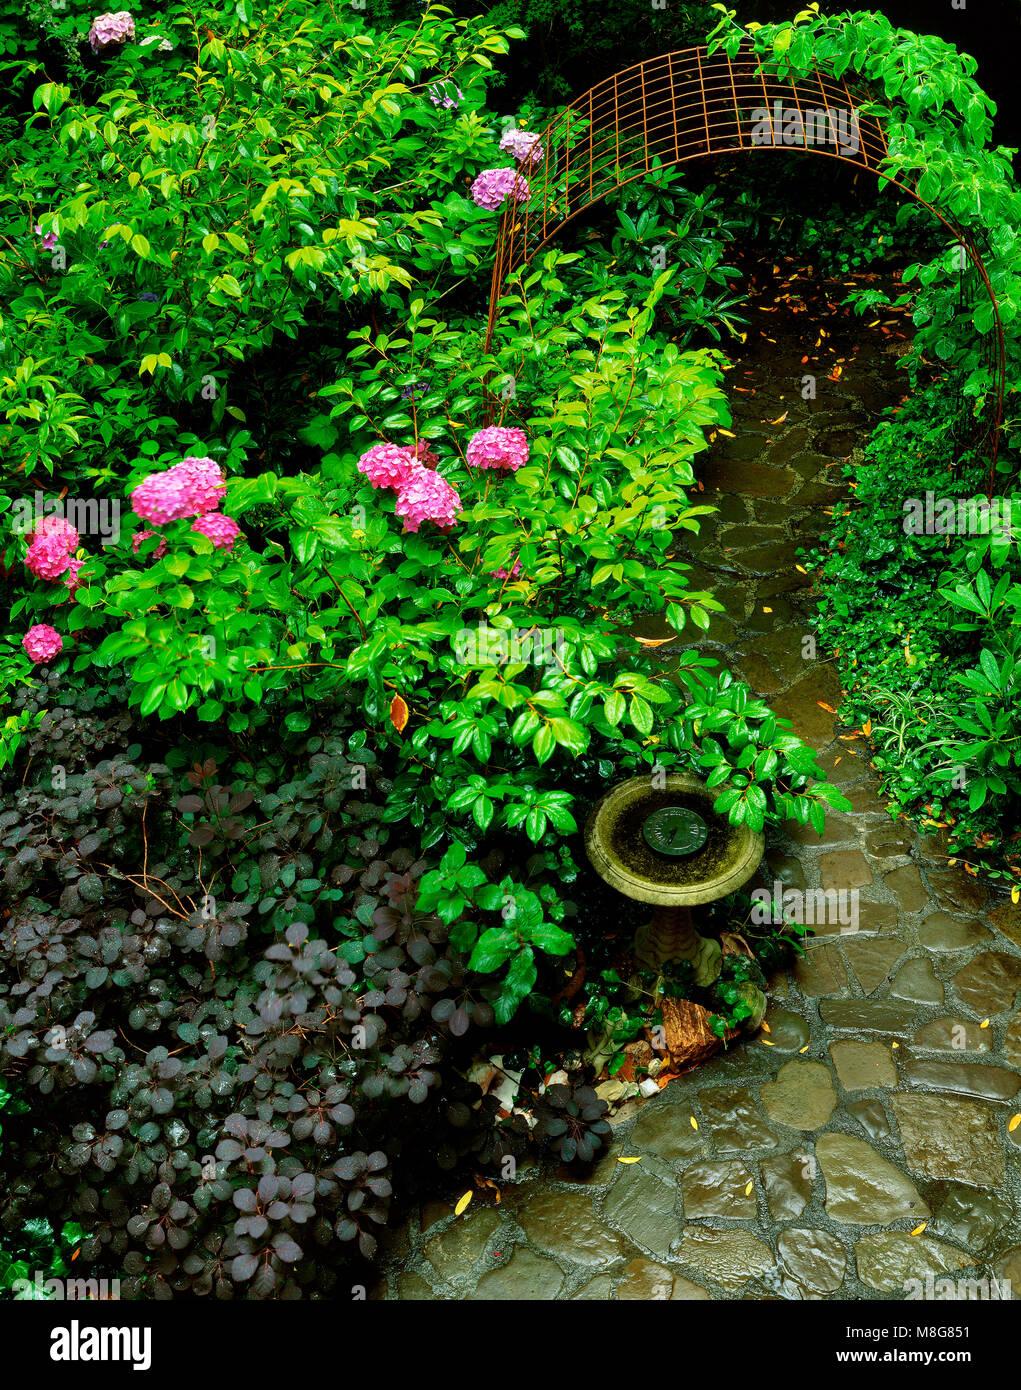 Camino del jardín, Cypress Garden, Mill Valley, California. Imagen De Stock